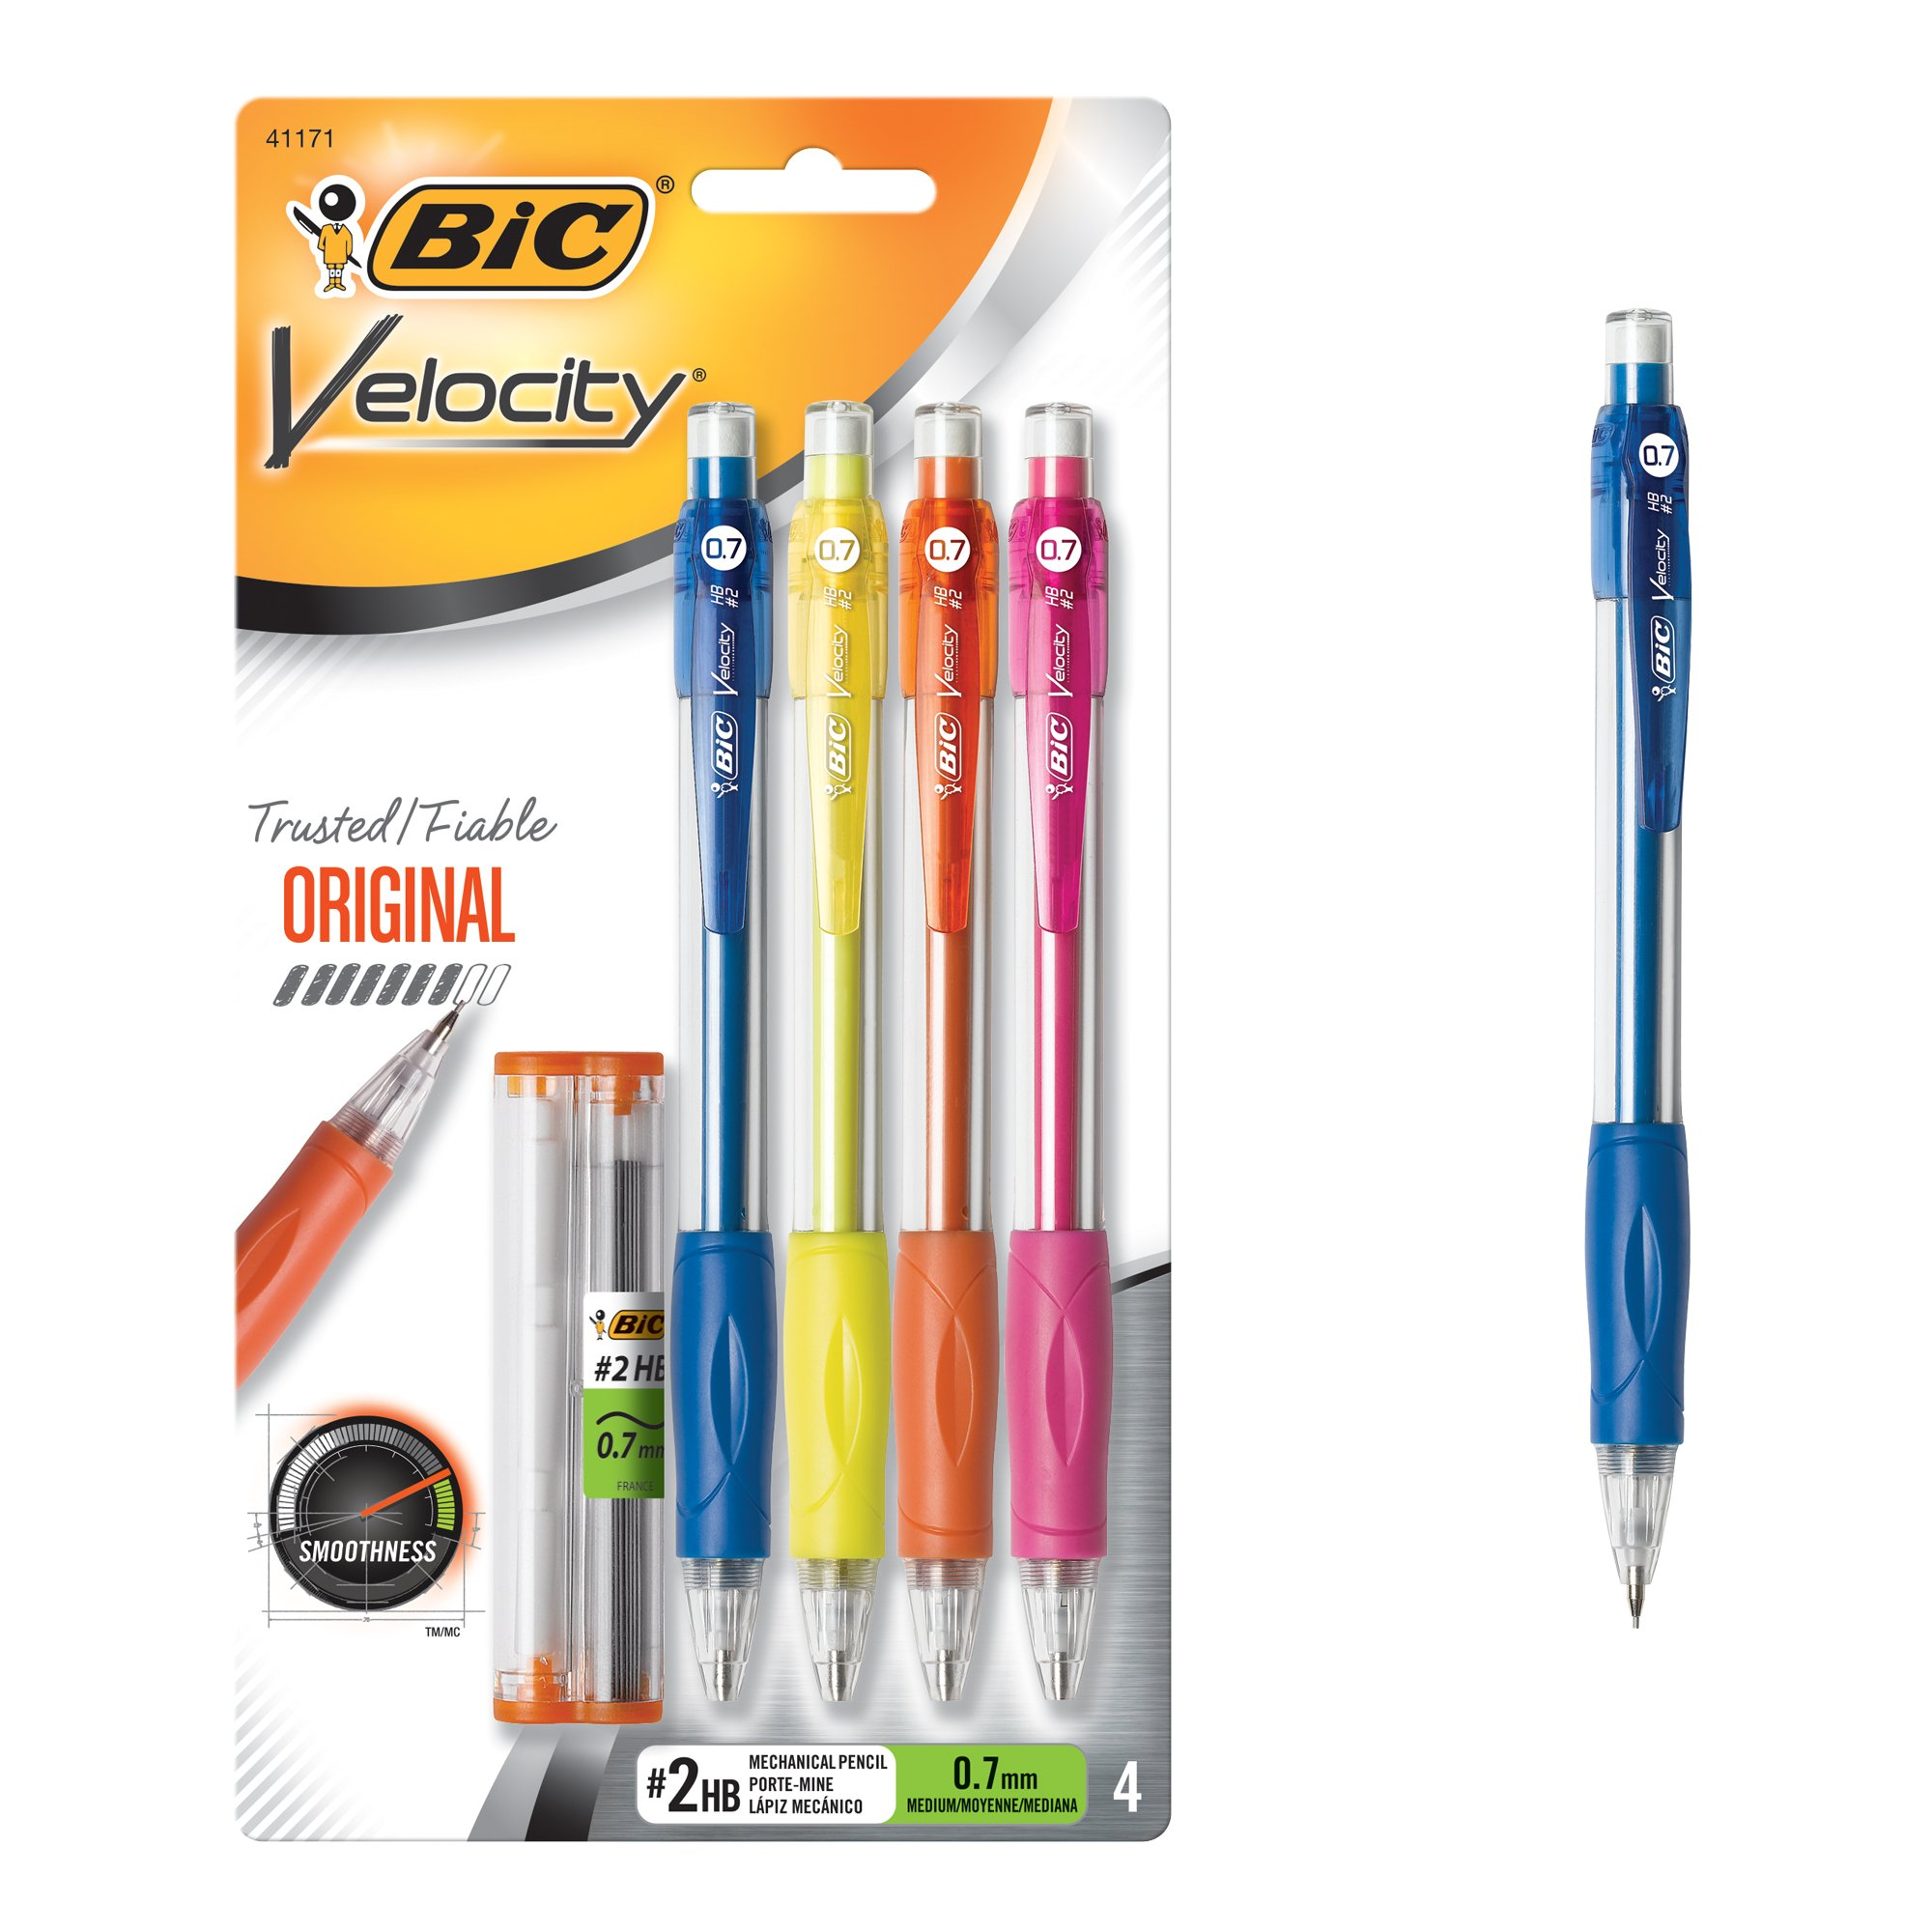 BIC Velocity portaminas 0,7 mm 4ct, negro (mv7p41-blk)